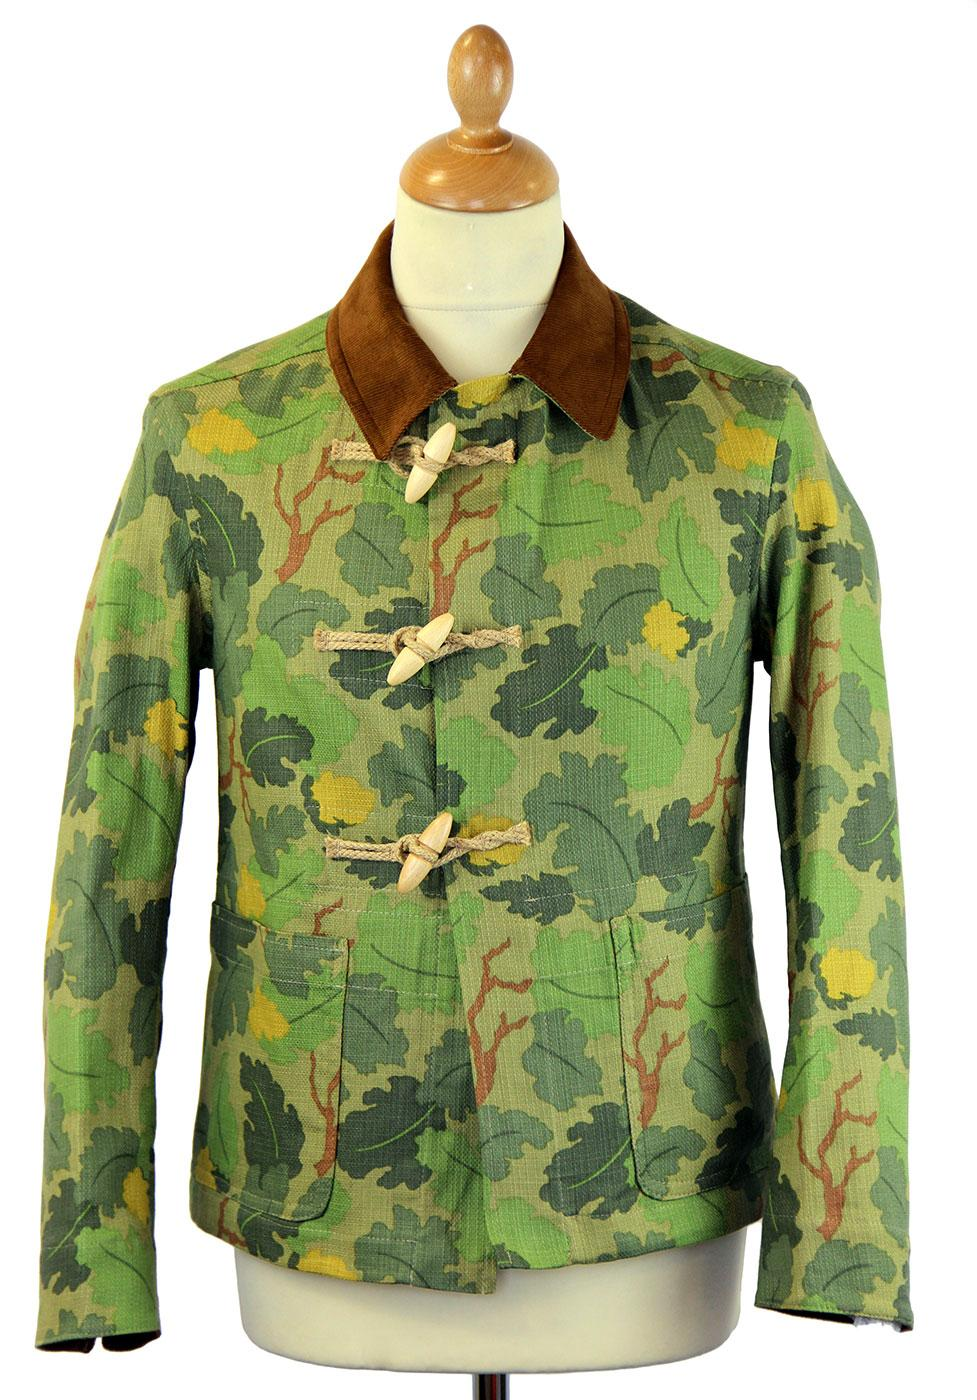 GLOVERALL 3531 Retro Mod Camo Linen Duffle Jacket